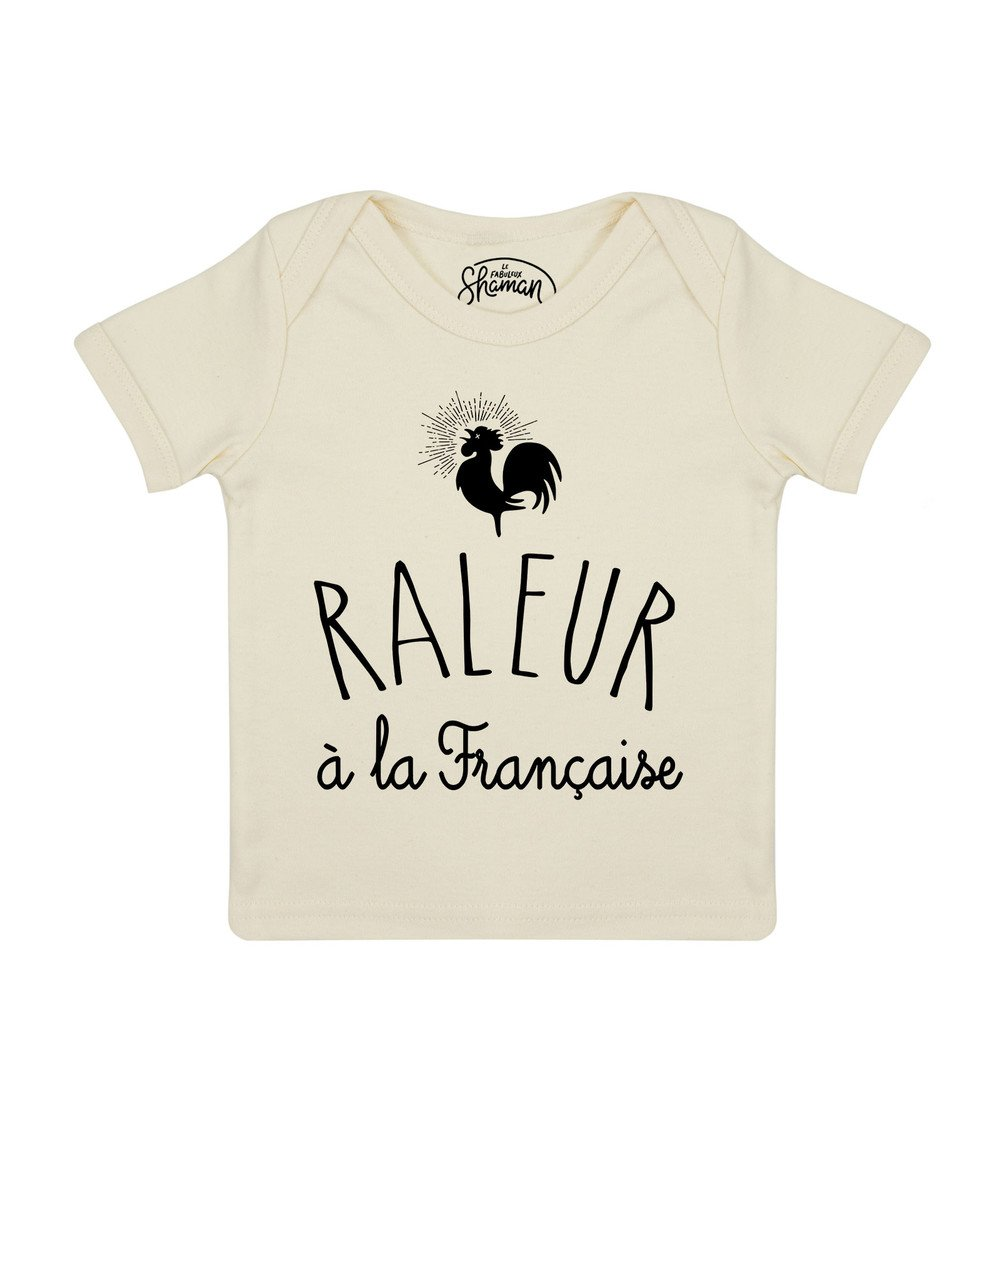 Tee shirt Râleur